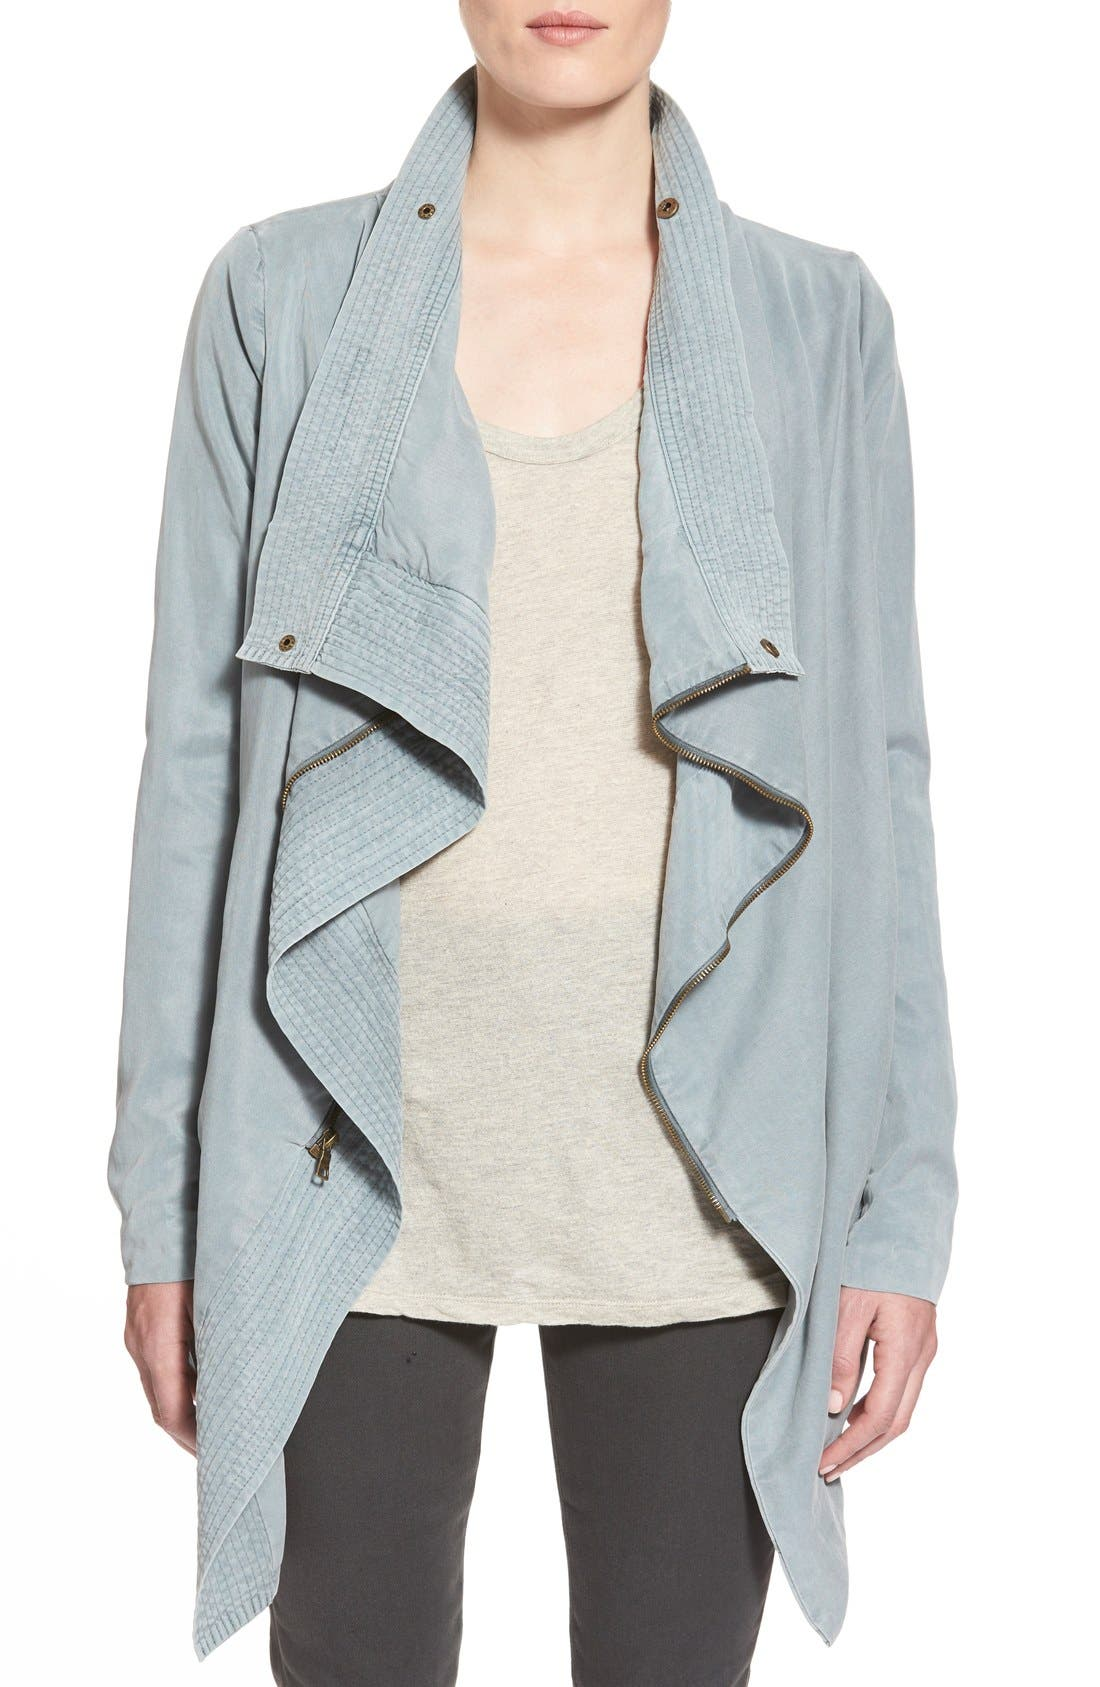 Main Image - Young Fabulous & Broke 'Lida' Jacket